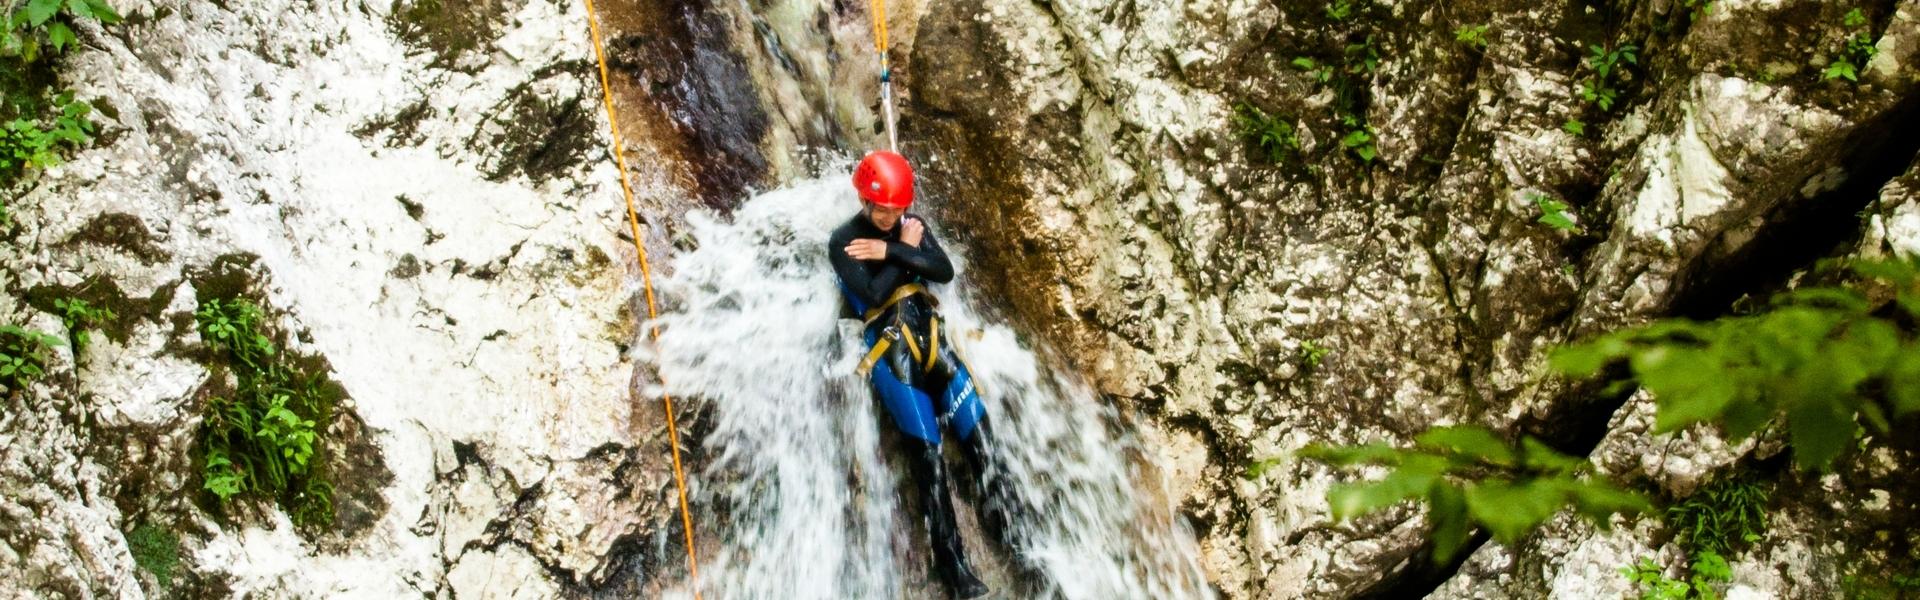 canyoning soča